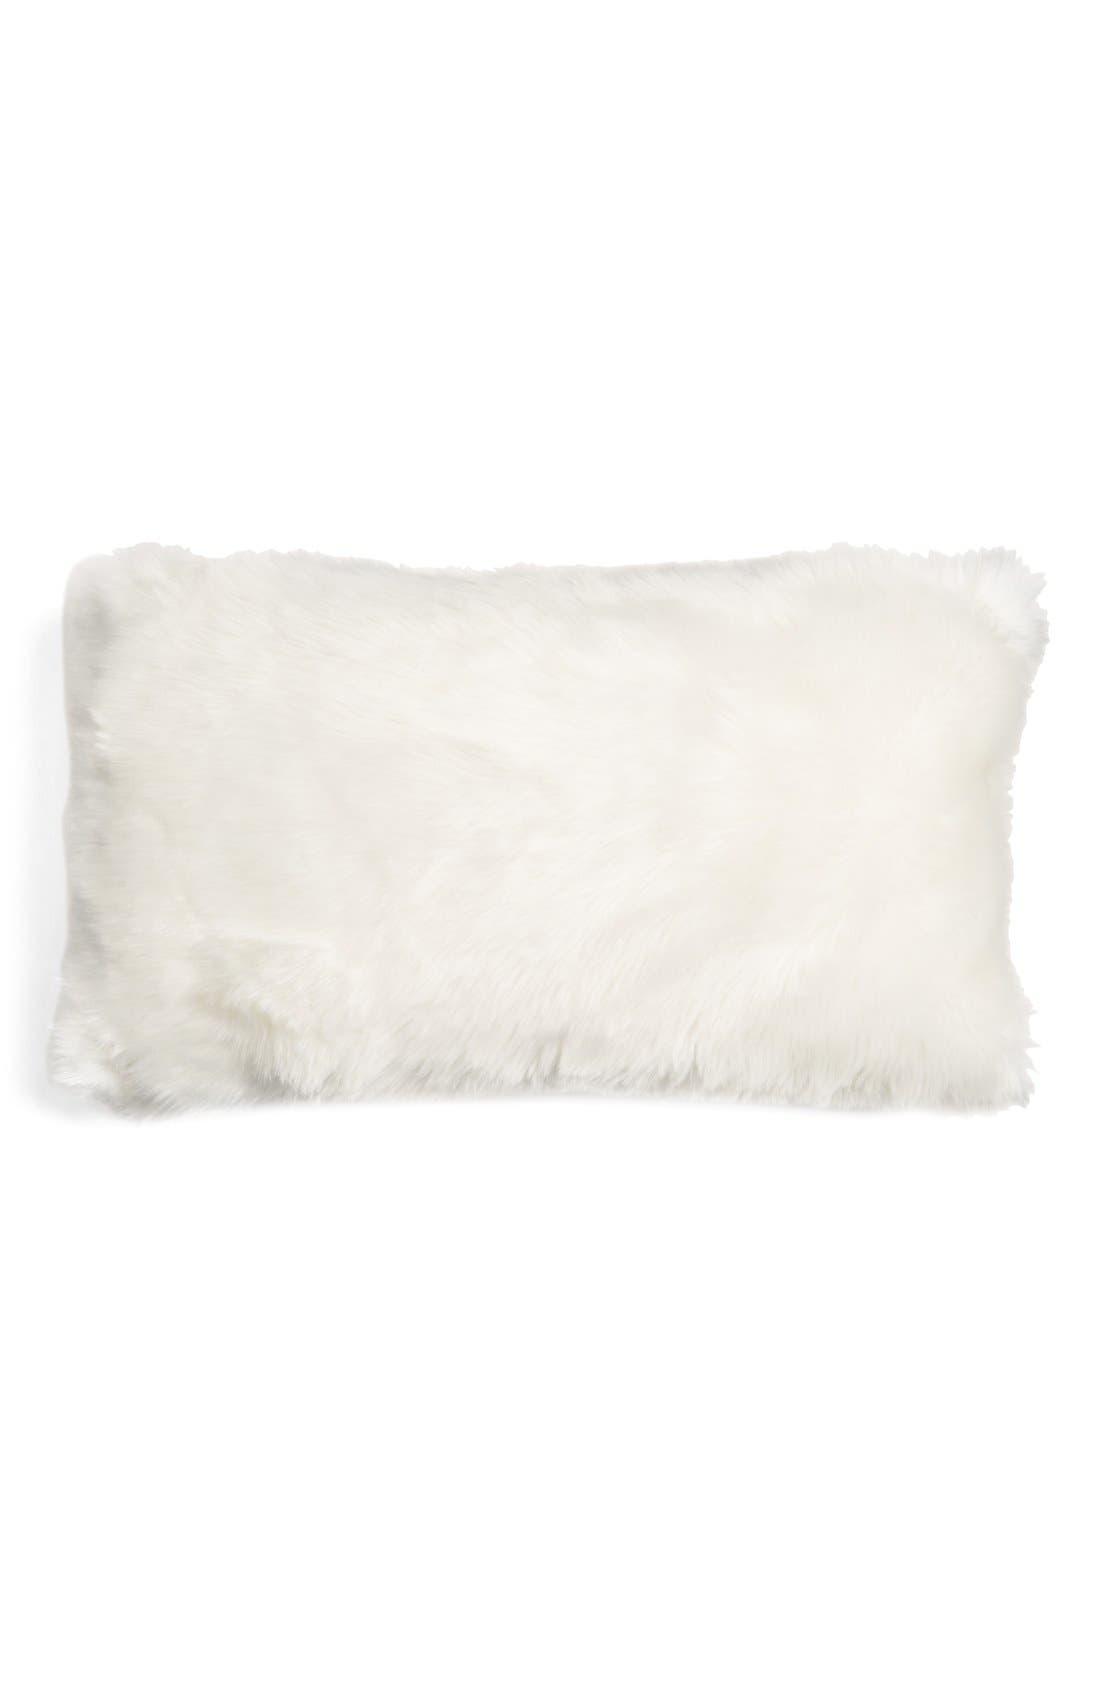 Main Image - Levtex 'Taza' Pillow